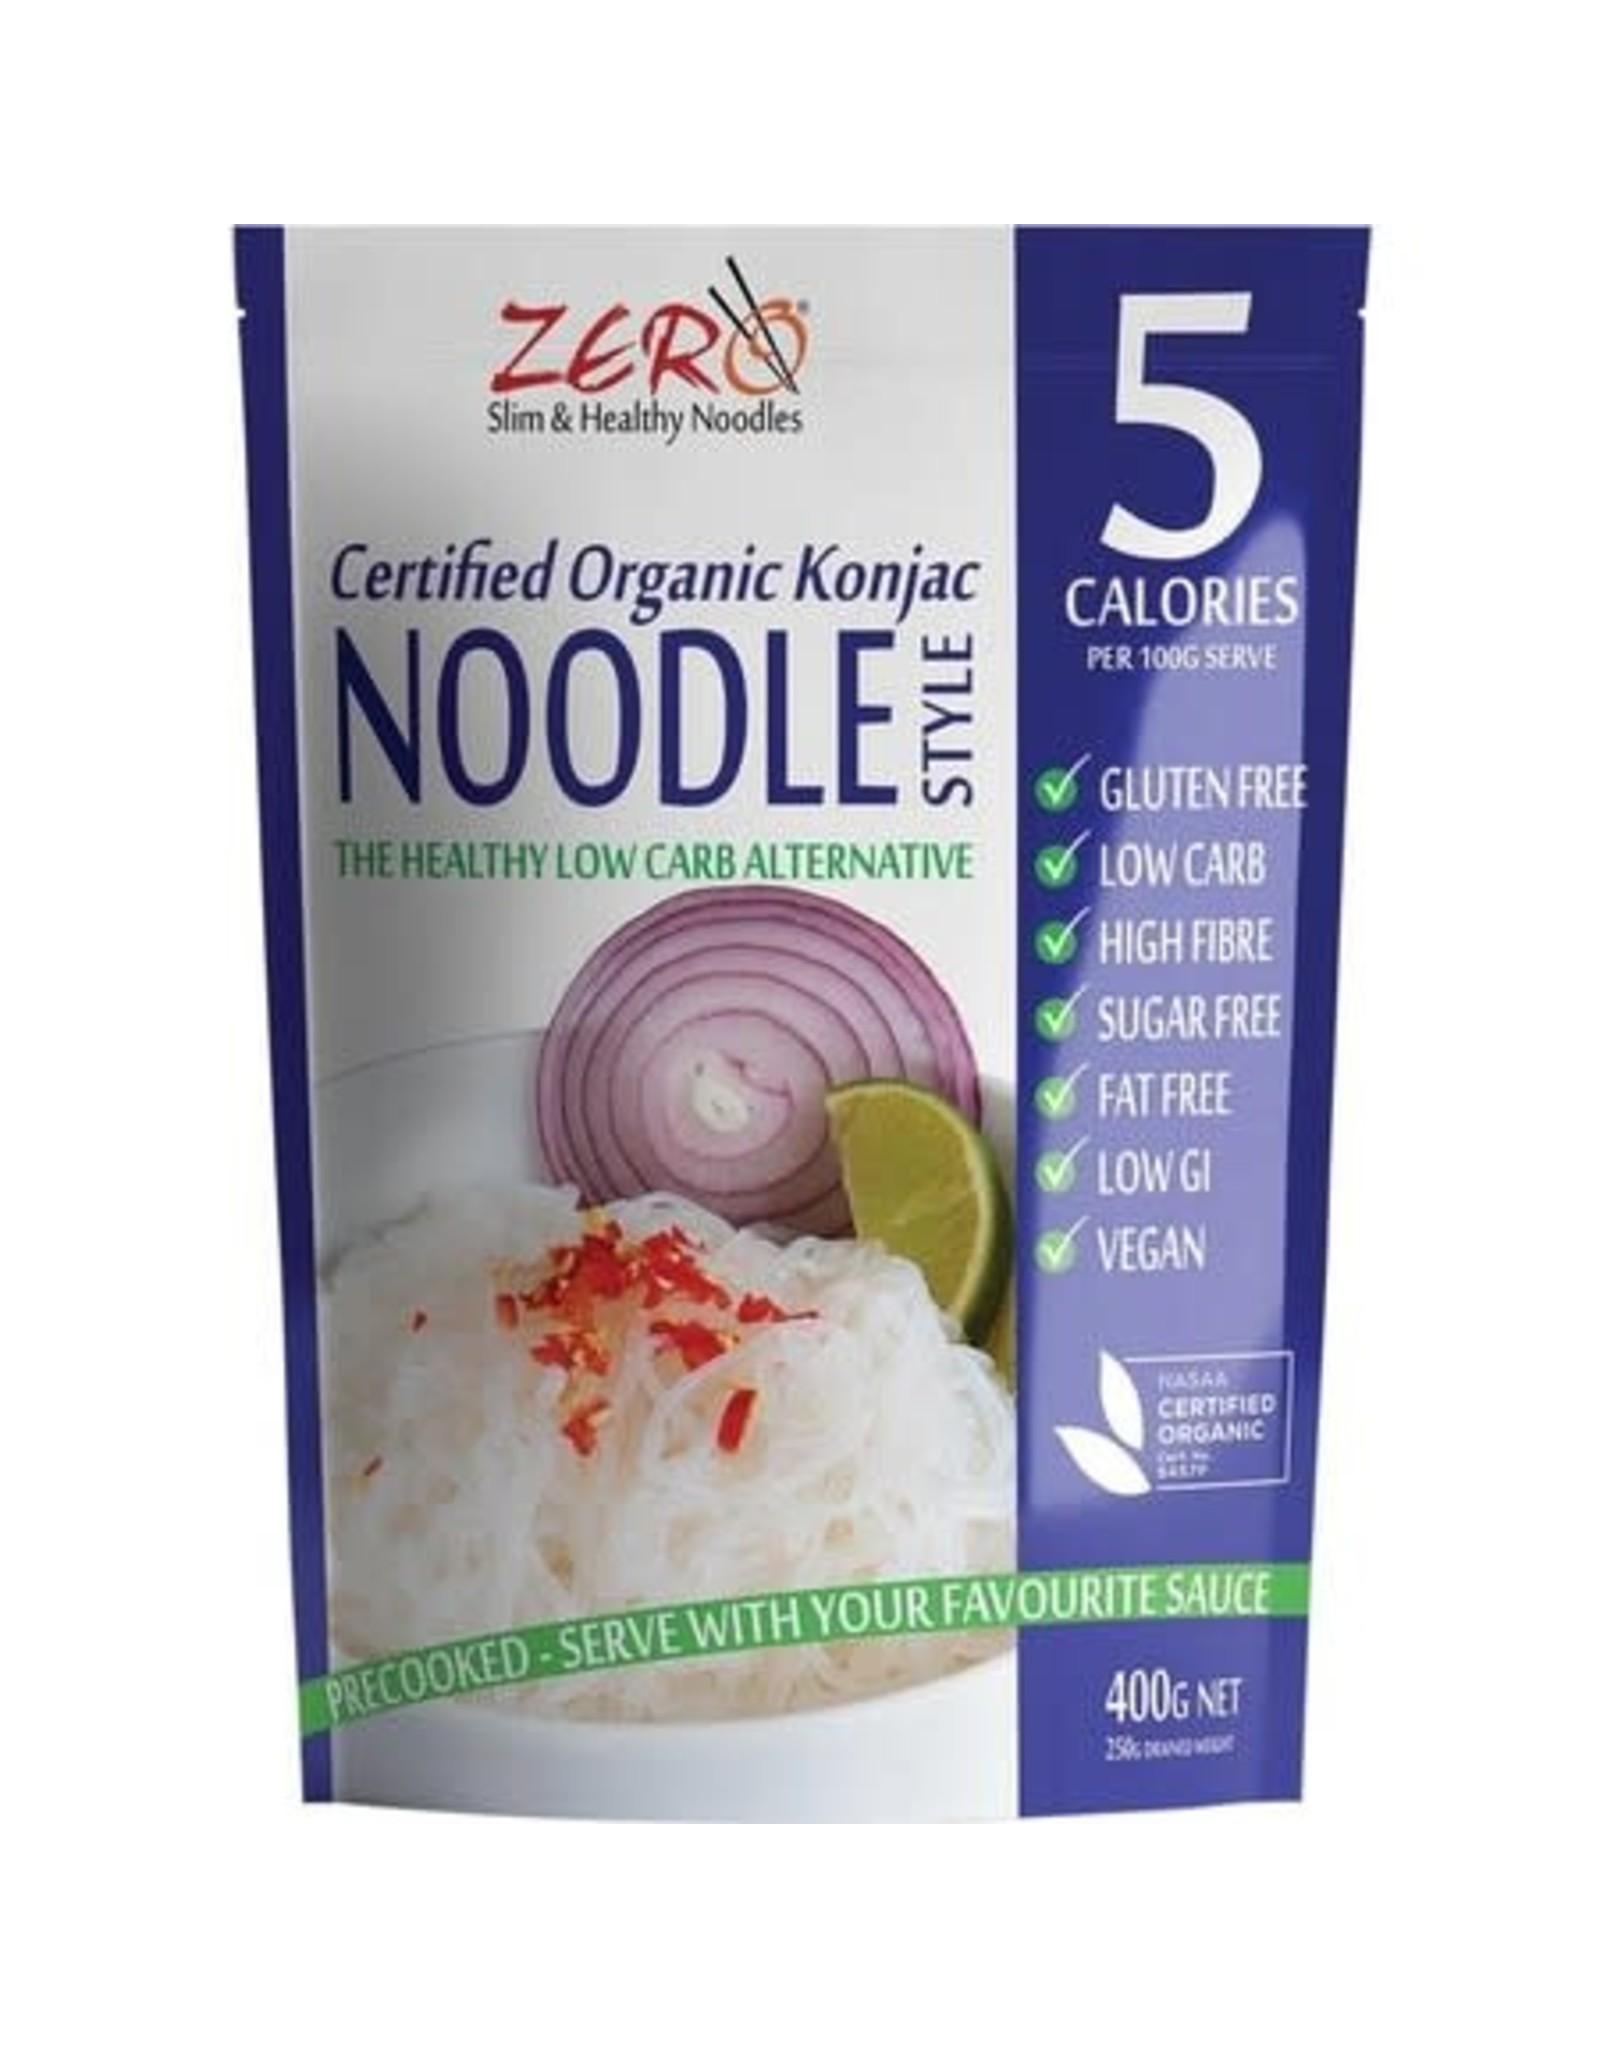 Zero Slim & Healthy Konjac Noodles - Organic - 400g